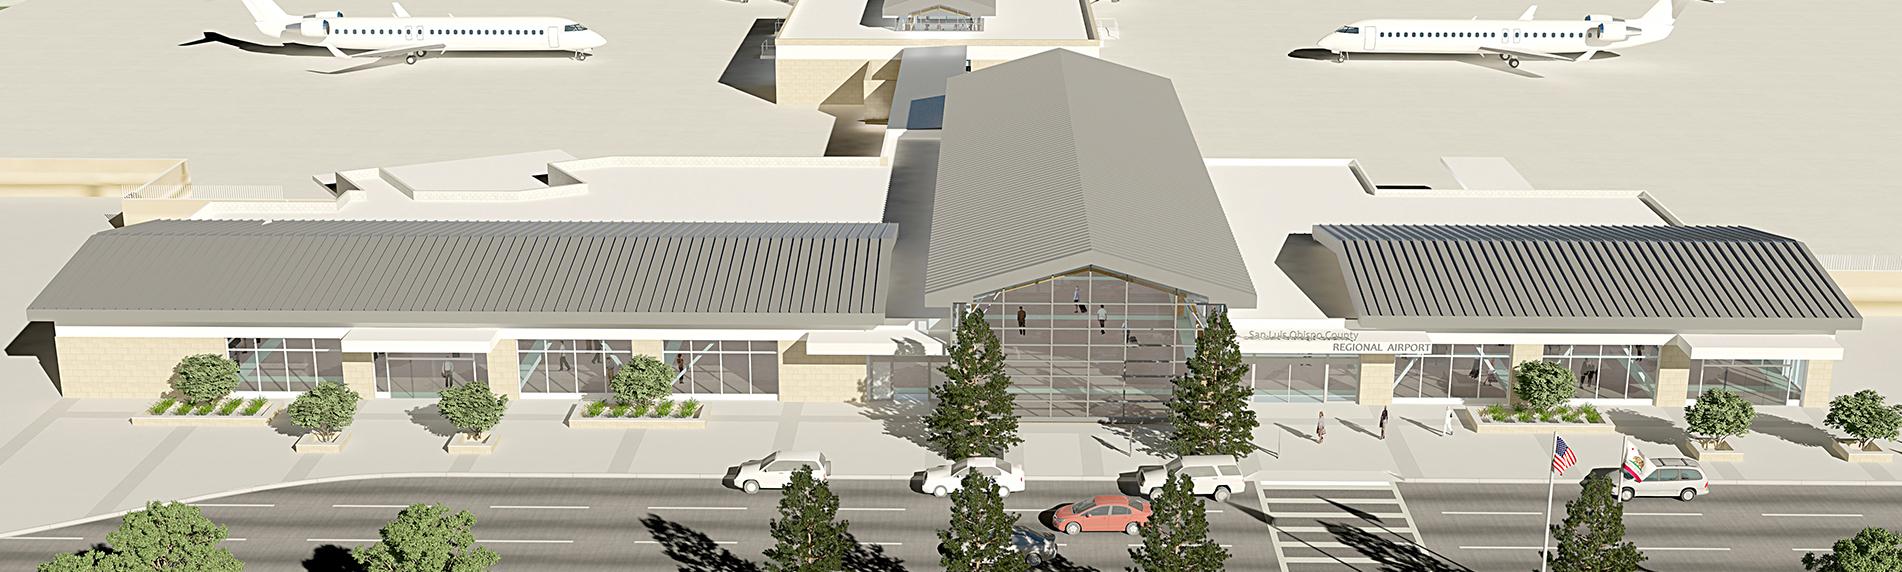 san luis obispo airport new terminal contractor